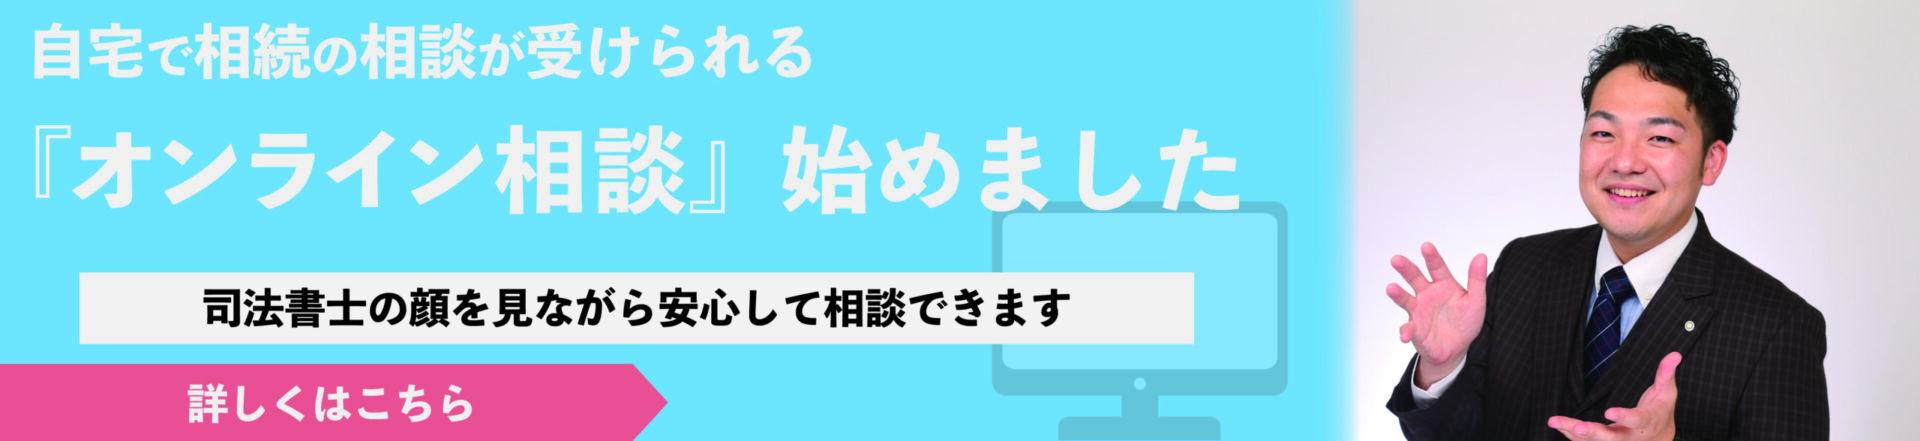 司法書士 オンライン相談 相続 富士市 富士宮市